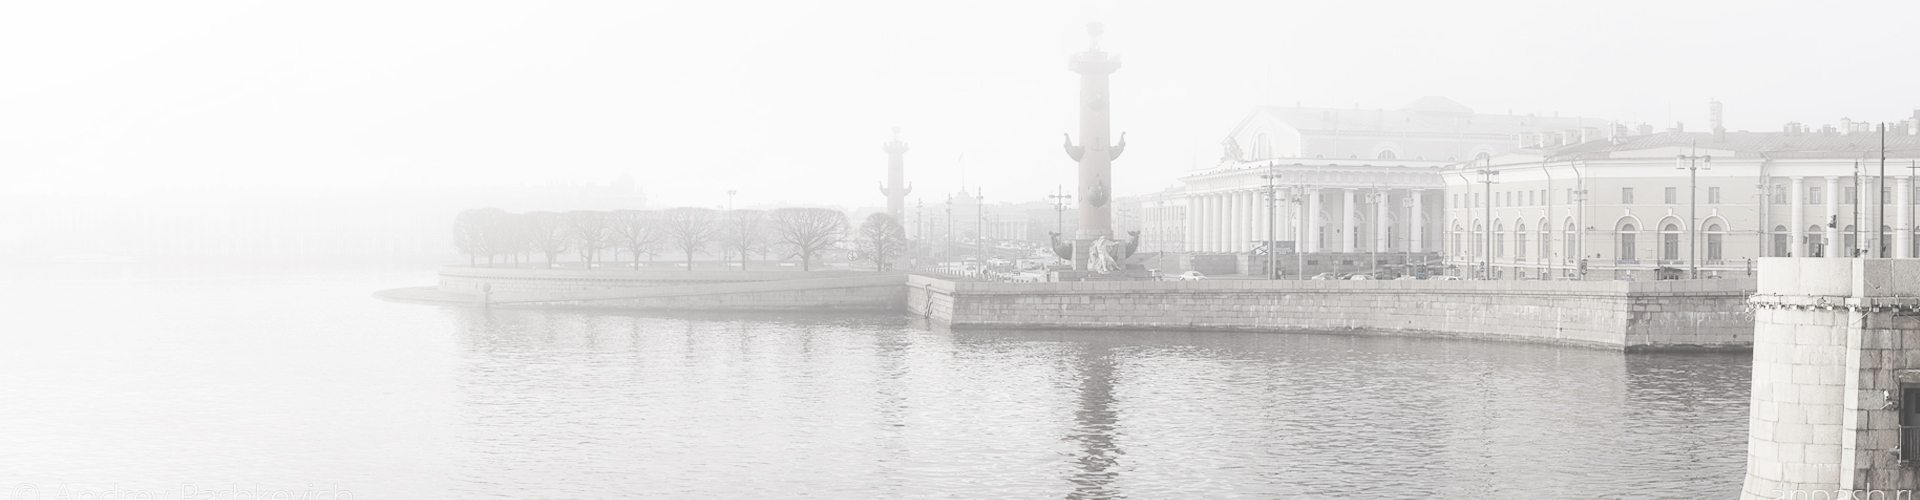 Санкт Петербург, Авдокат по долгам, кредитам, налогам и ипотеке